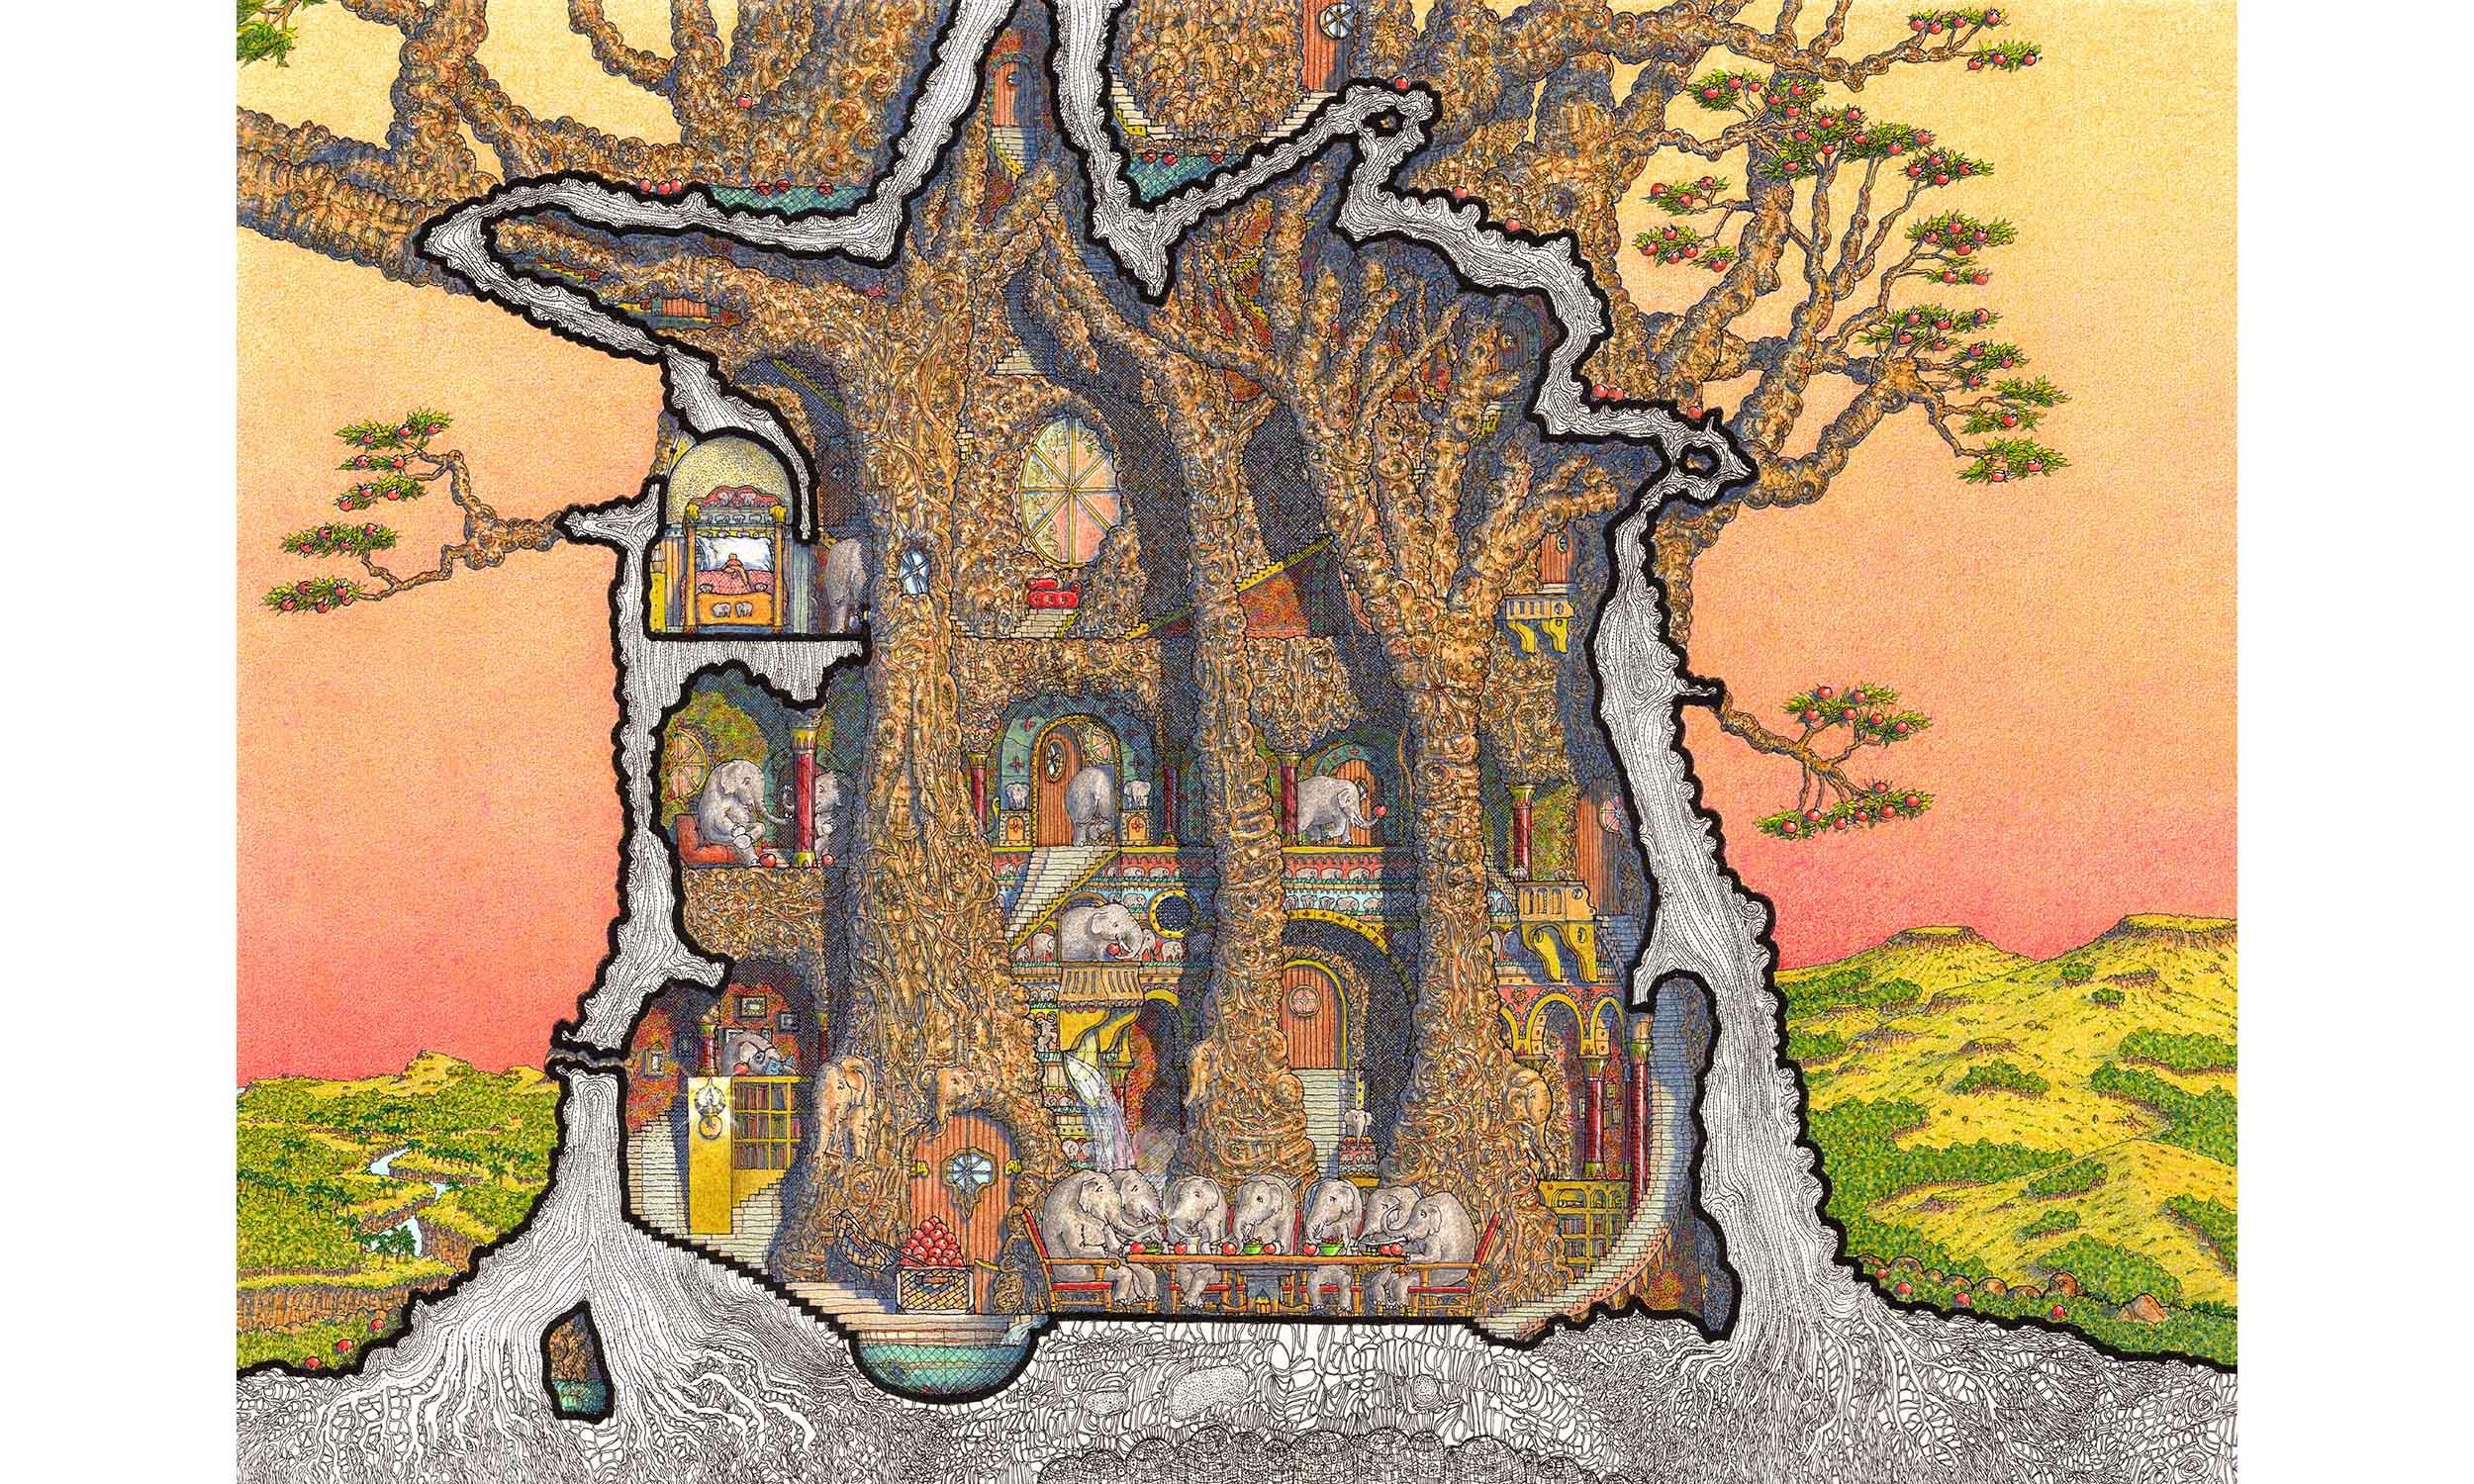 The Elephant Tree Interior